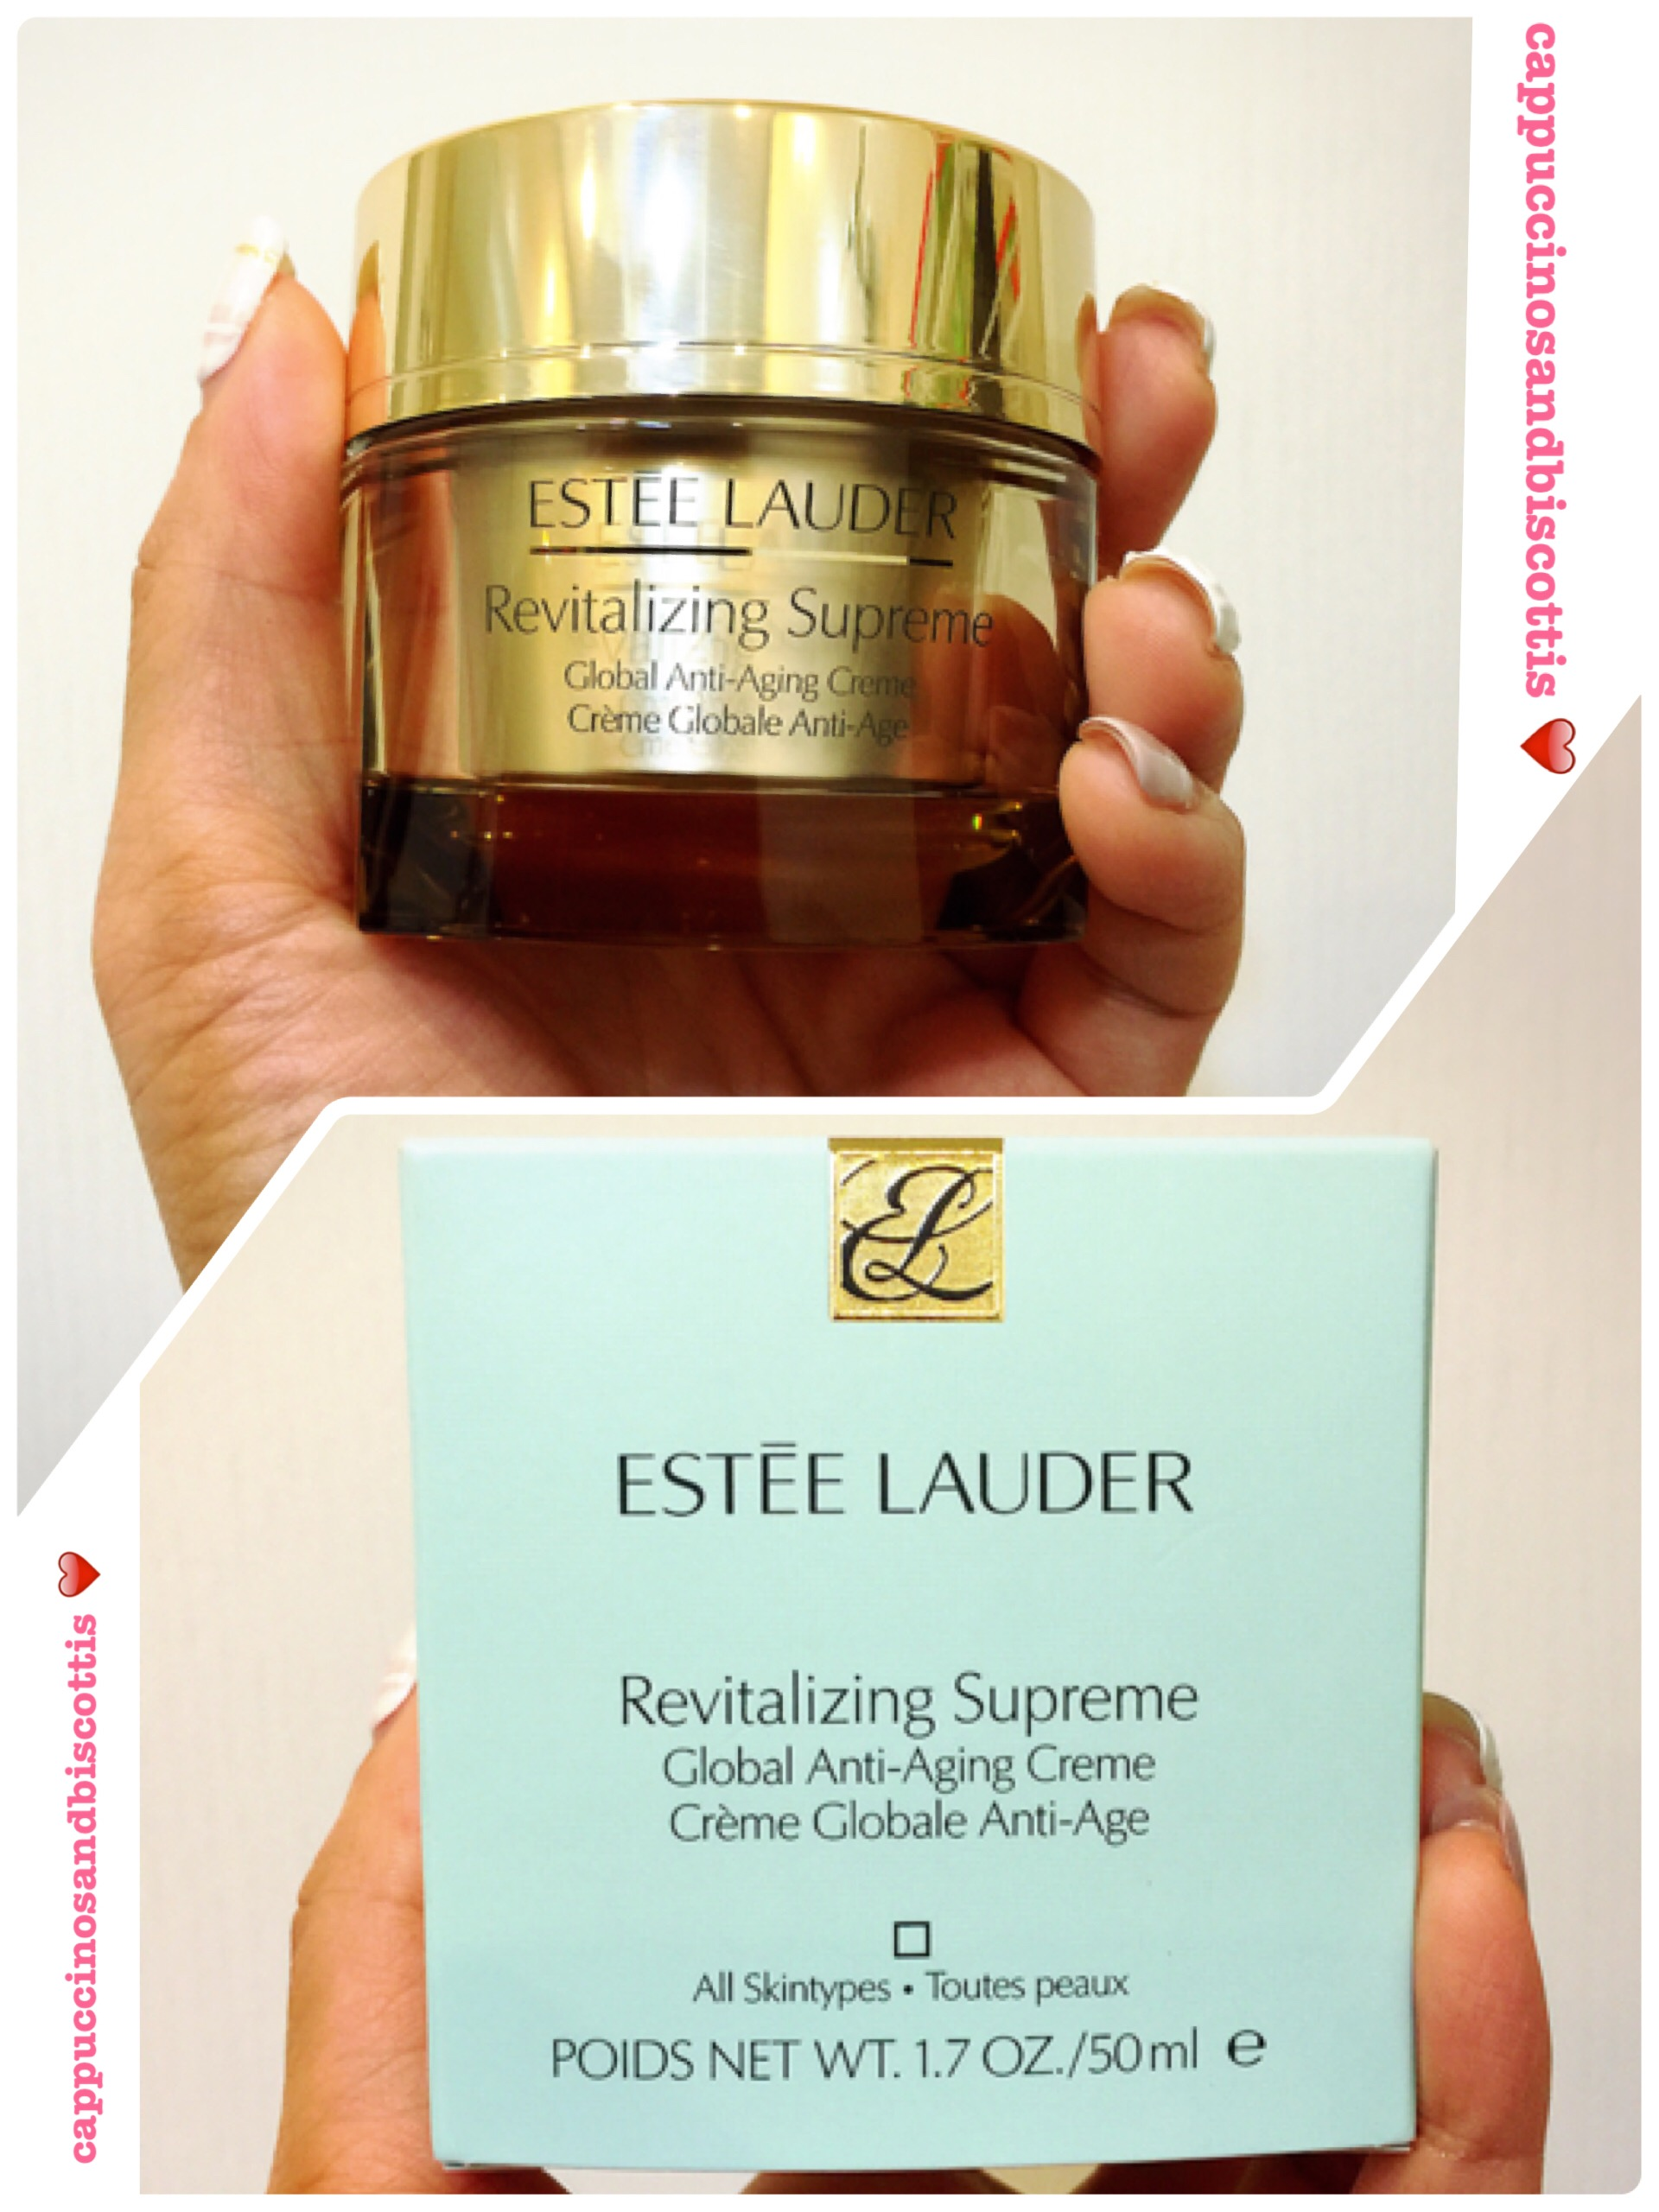 5eaeea0f348d4 Estée Lauder Revitalizing Supreme Global Anti-aging Face Cream Review –  cappuccinos and biscottis